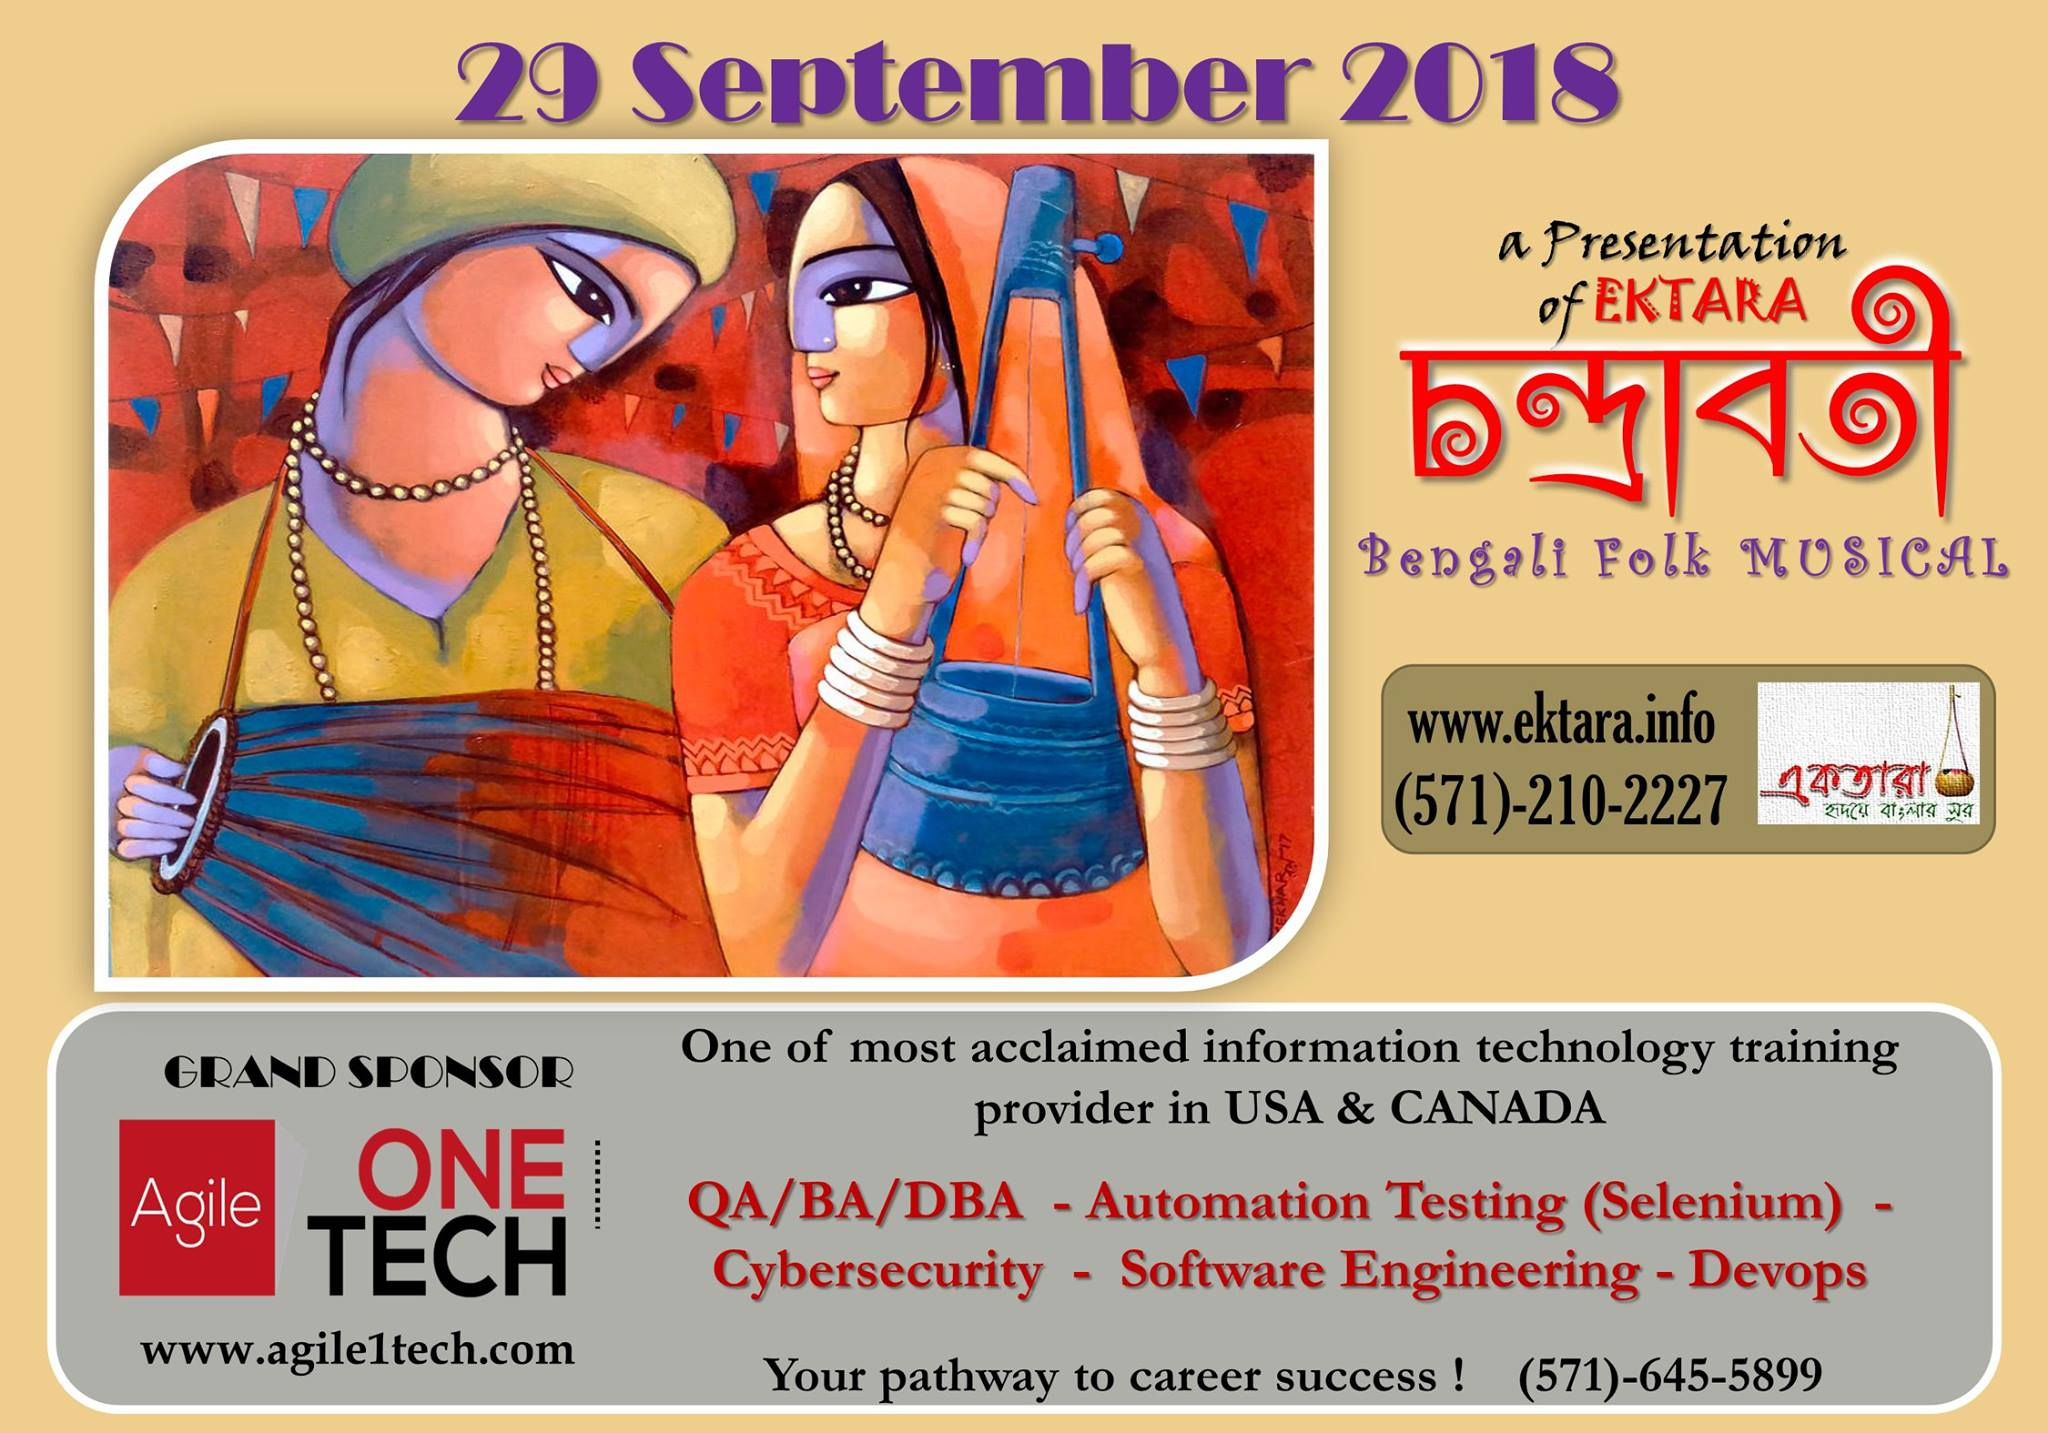 EKTARA Presents Chandrabati on September 29, 2018